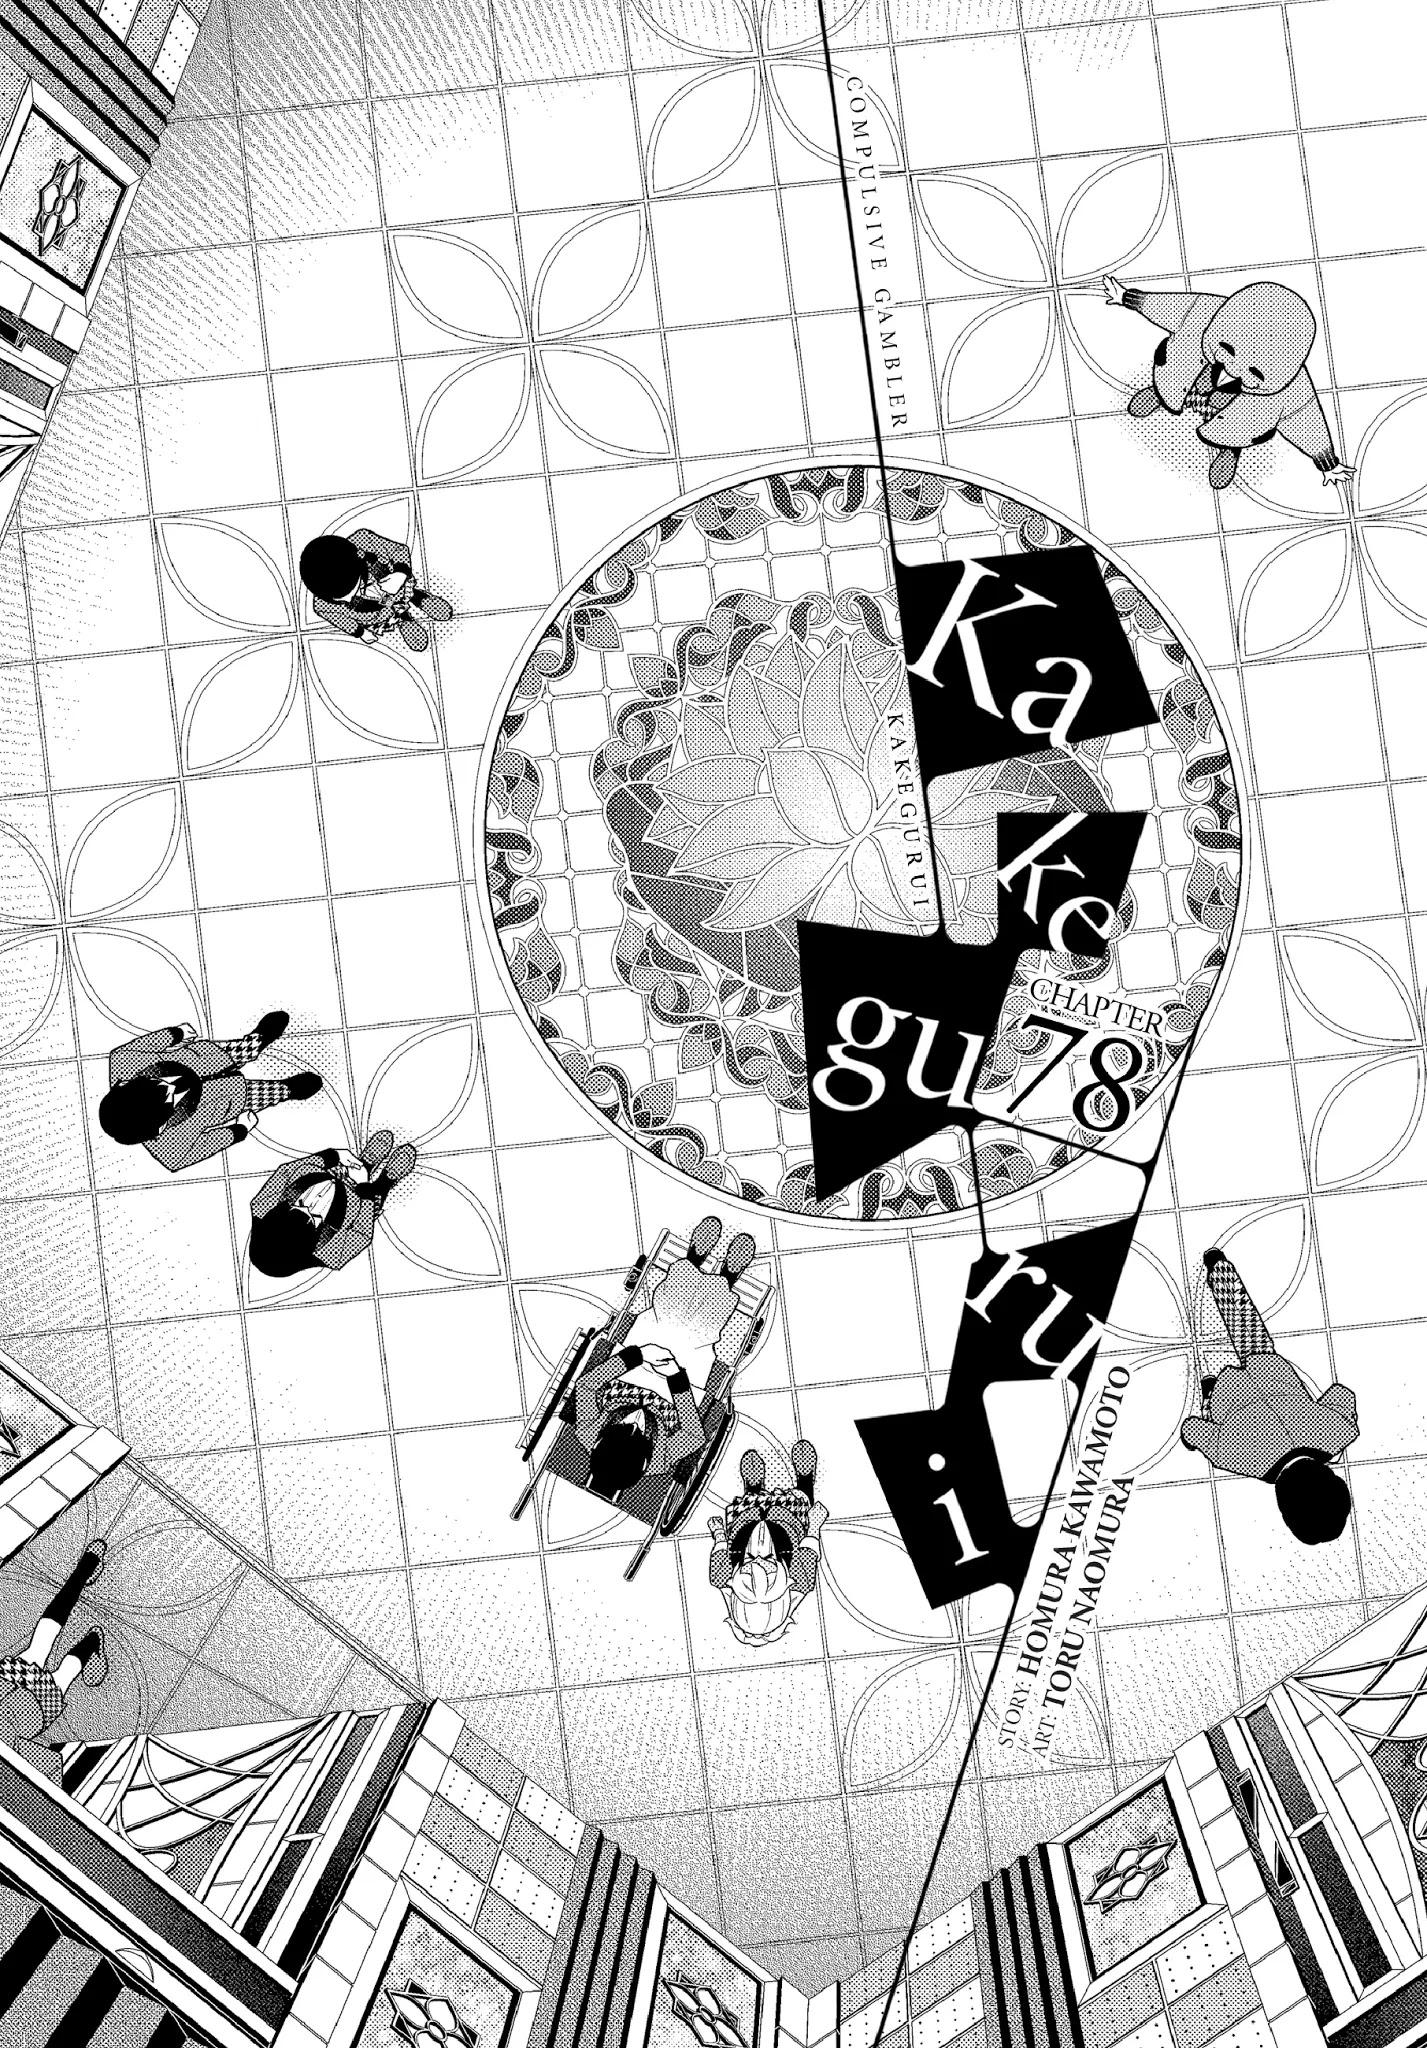 kakegurui fandom, when is the next episode of kakegurui, kakegurui pronounce, mappa studio anime, kakegurui cast anime, kakegurui live-action cast, kakegurui live action cast president, kakegurui live action download, kakegurui anime season 3, gamers anilist, knights and magic anilist, anilist hajimete no gal, anilist isekai, anichart princess principal, classroom of the elite anilist, kakegurui compulsive gambler film, Kakegurui: Compulsive Gambler, Kakegurui, Kakegurui manga, Kakegurui anime, Kakegurui novel, kakegurui season 2 ending, kakegurui season 2 episode 1, kakegurui gif, kakegurui yuri, kakegurui kari